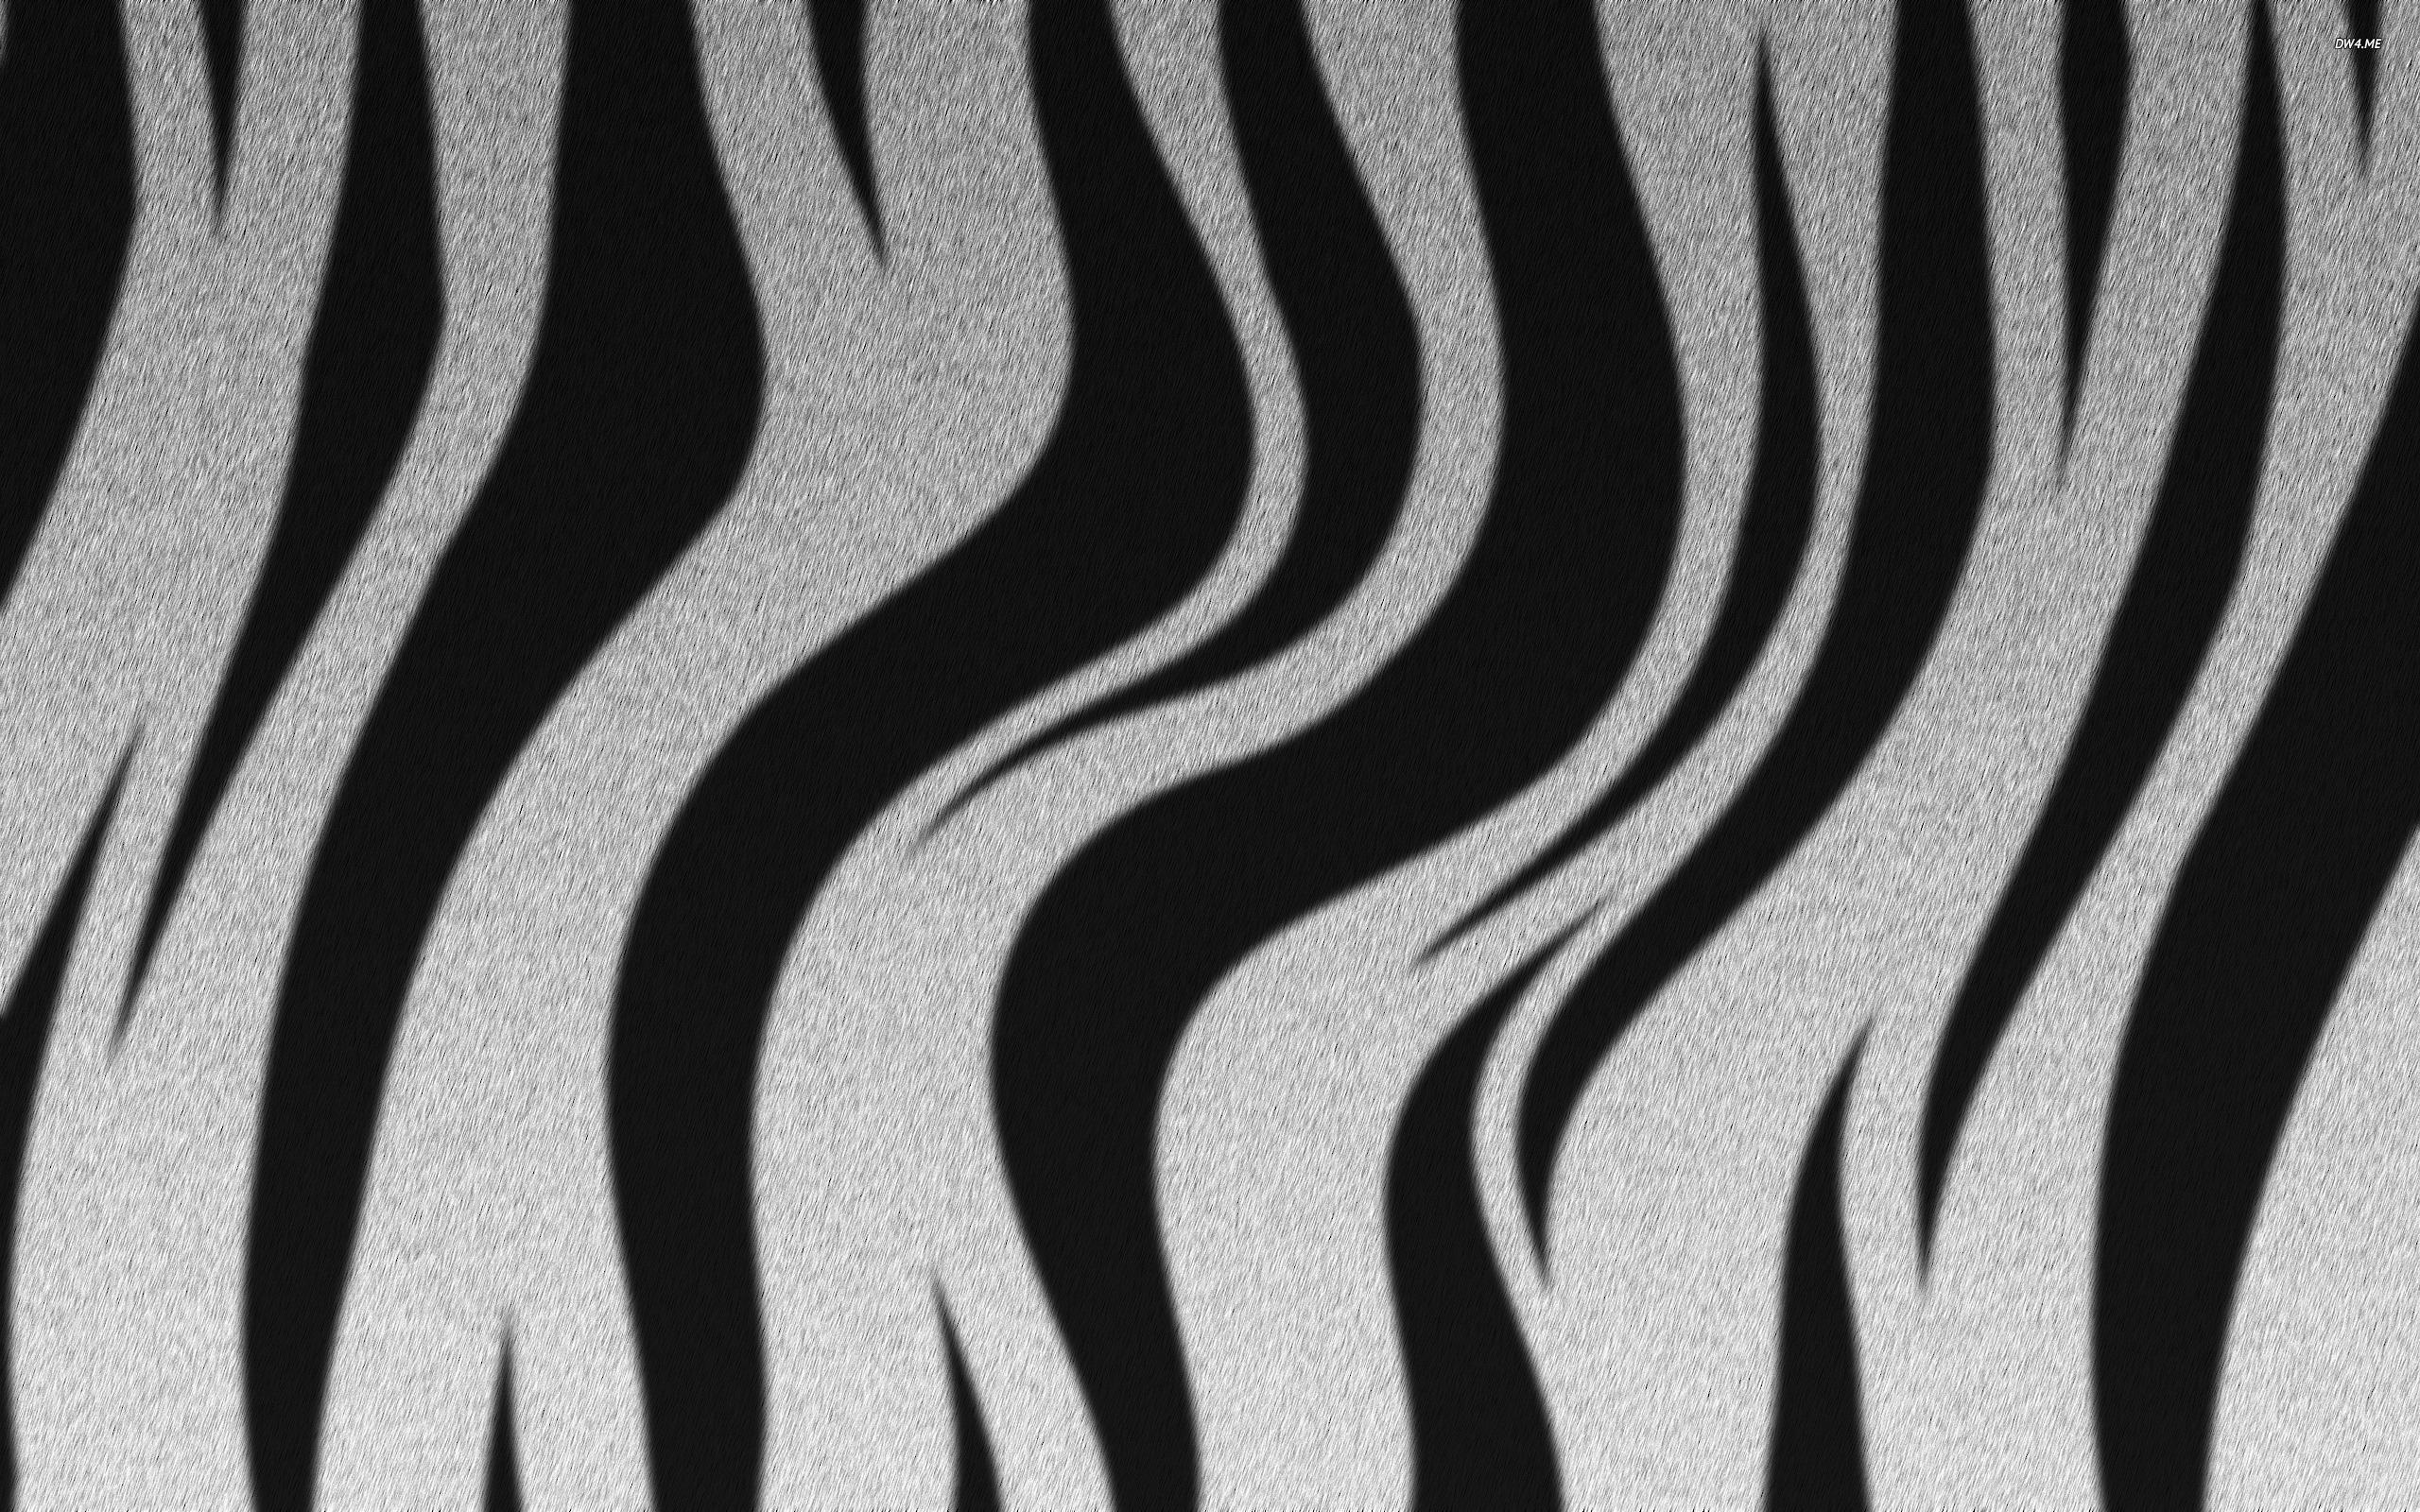 Zebra stripes wallpaper   Digital Art wallpapers   752 2560x1600